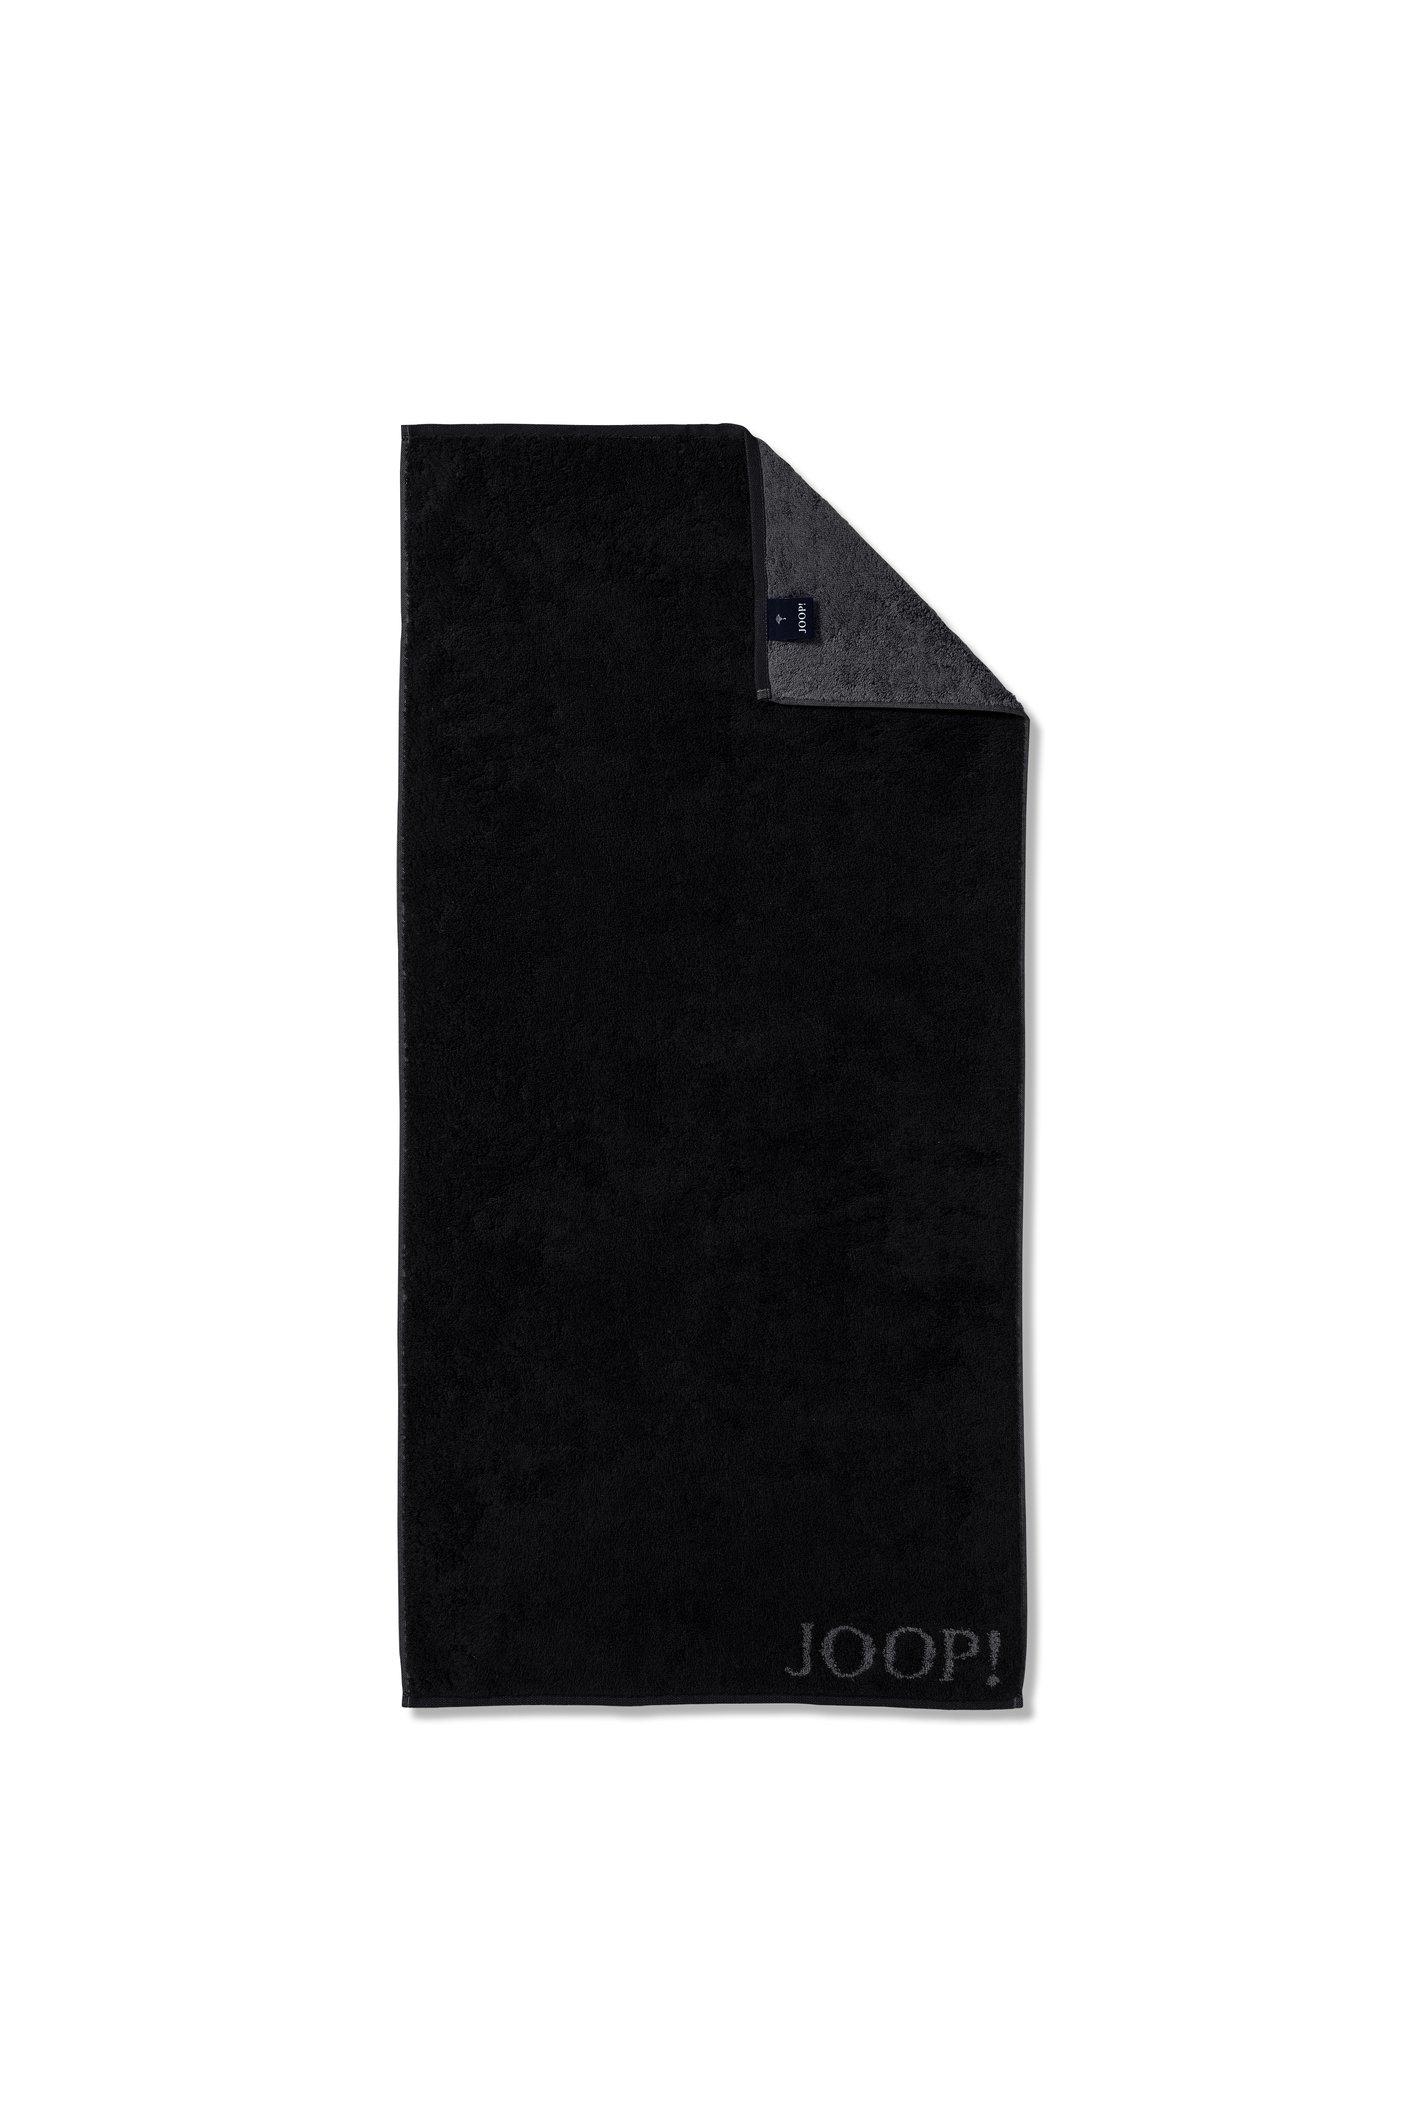 JOOP! Classic Doubleface Handtuch 50x100 cm 1600-90 Schwarz Kollektion 2020